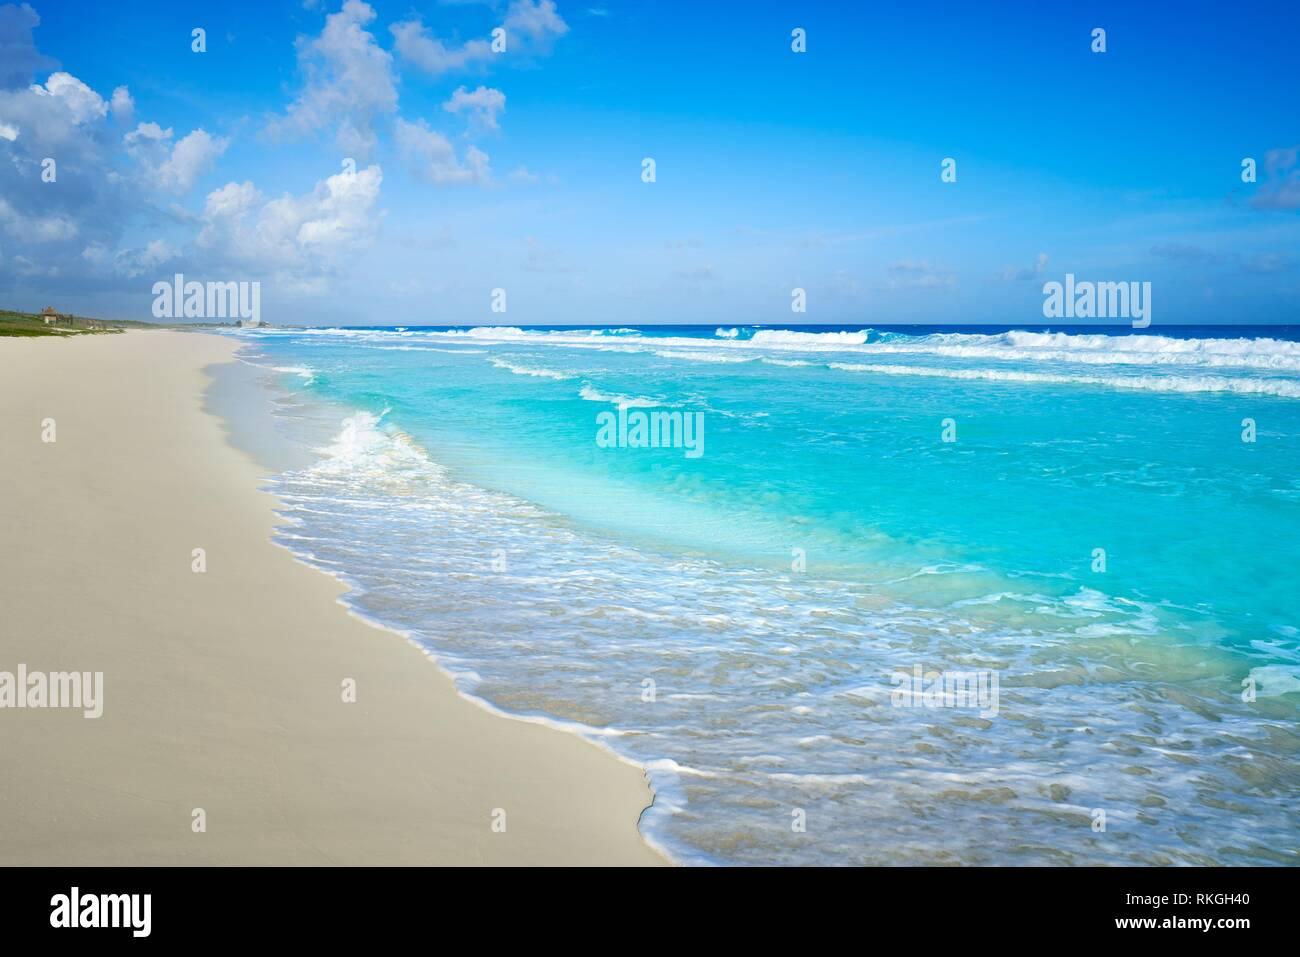 Cozumel island San Martin beach in Riviera Maya of Mayan Mexico. - Stock Image